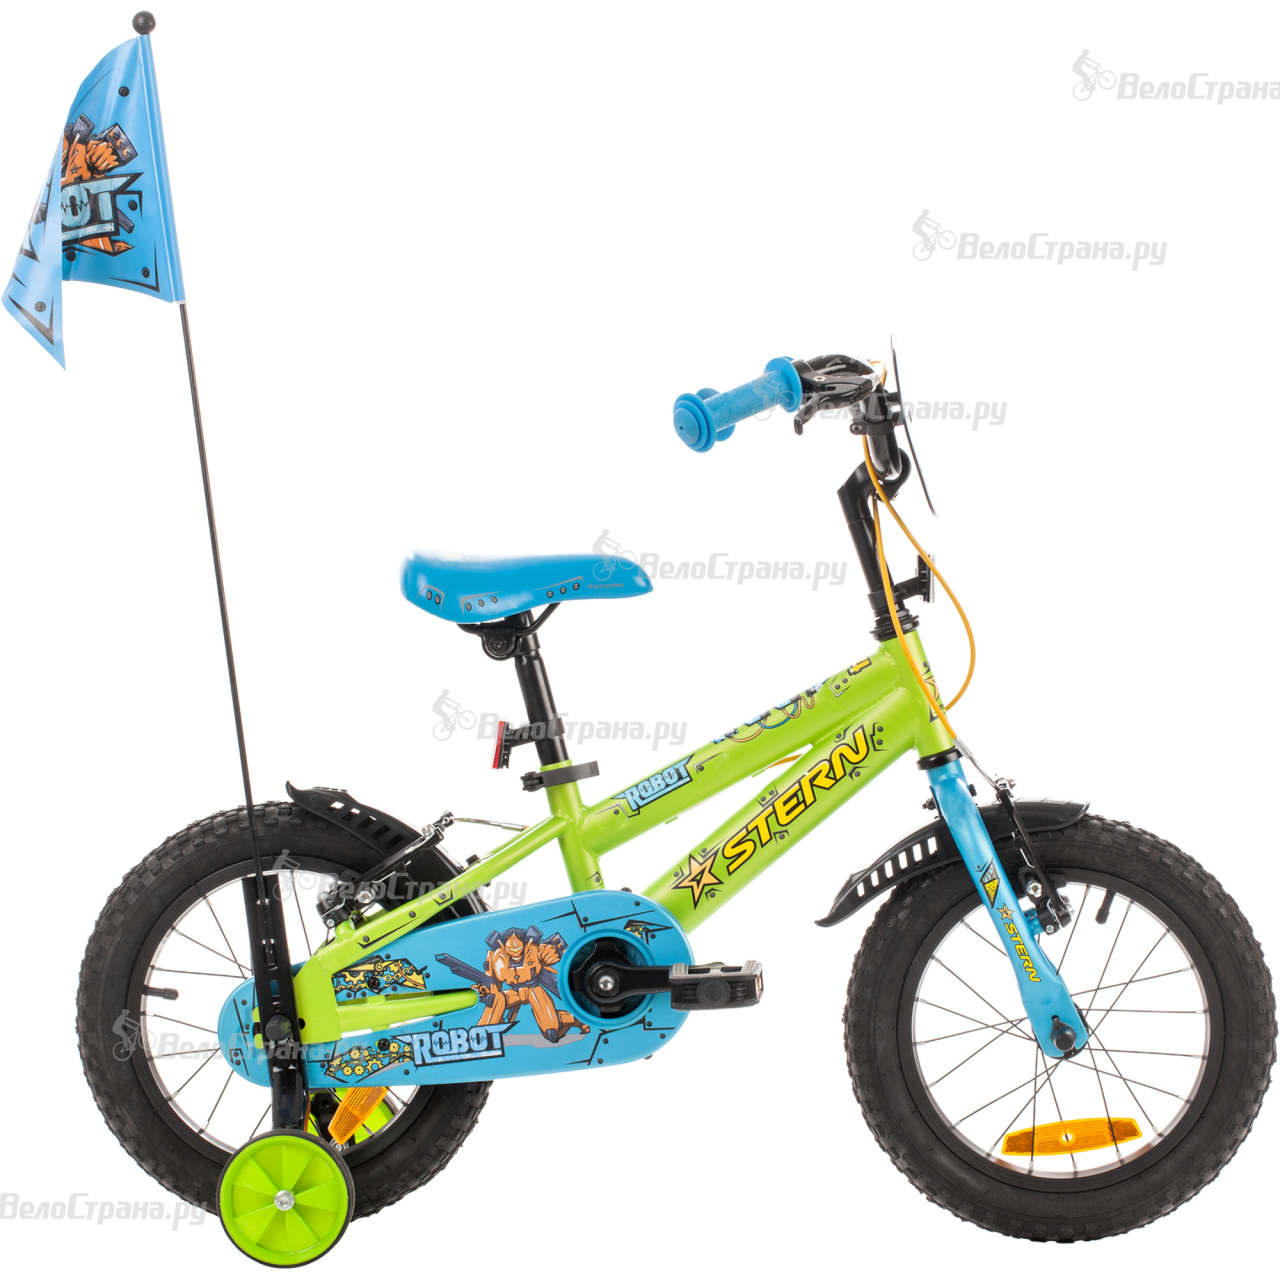 Велосипед Stern Robot 14 (2017) stern велосипед складной stern compact 2 0 20